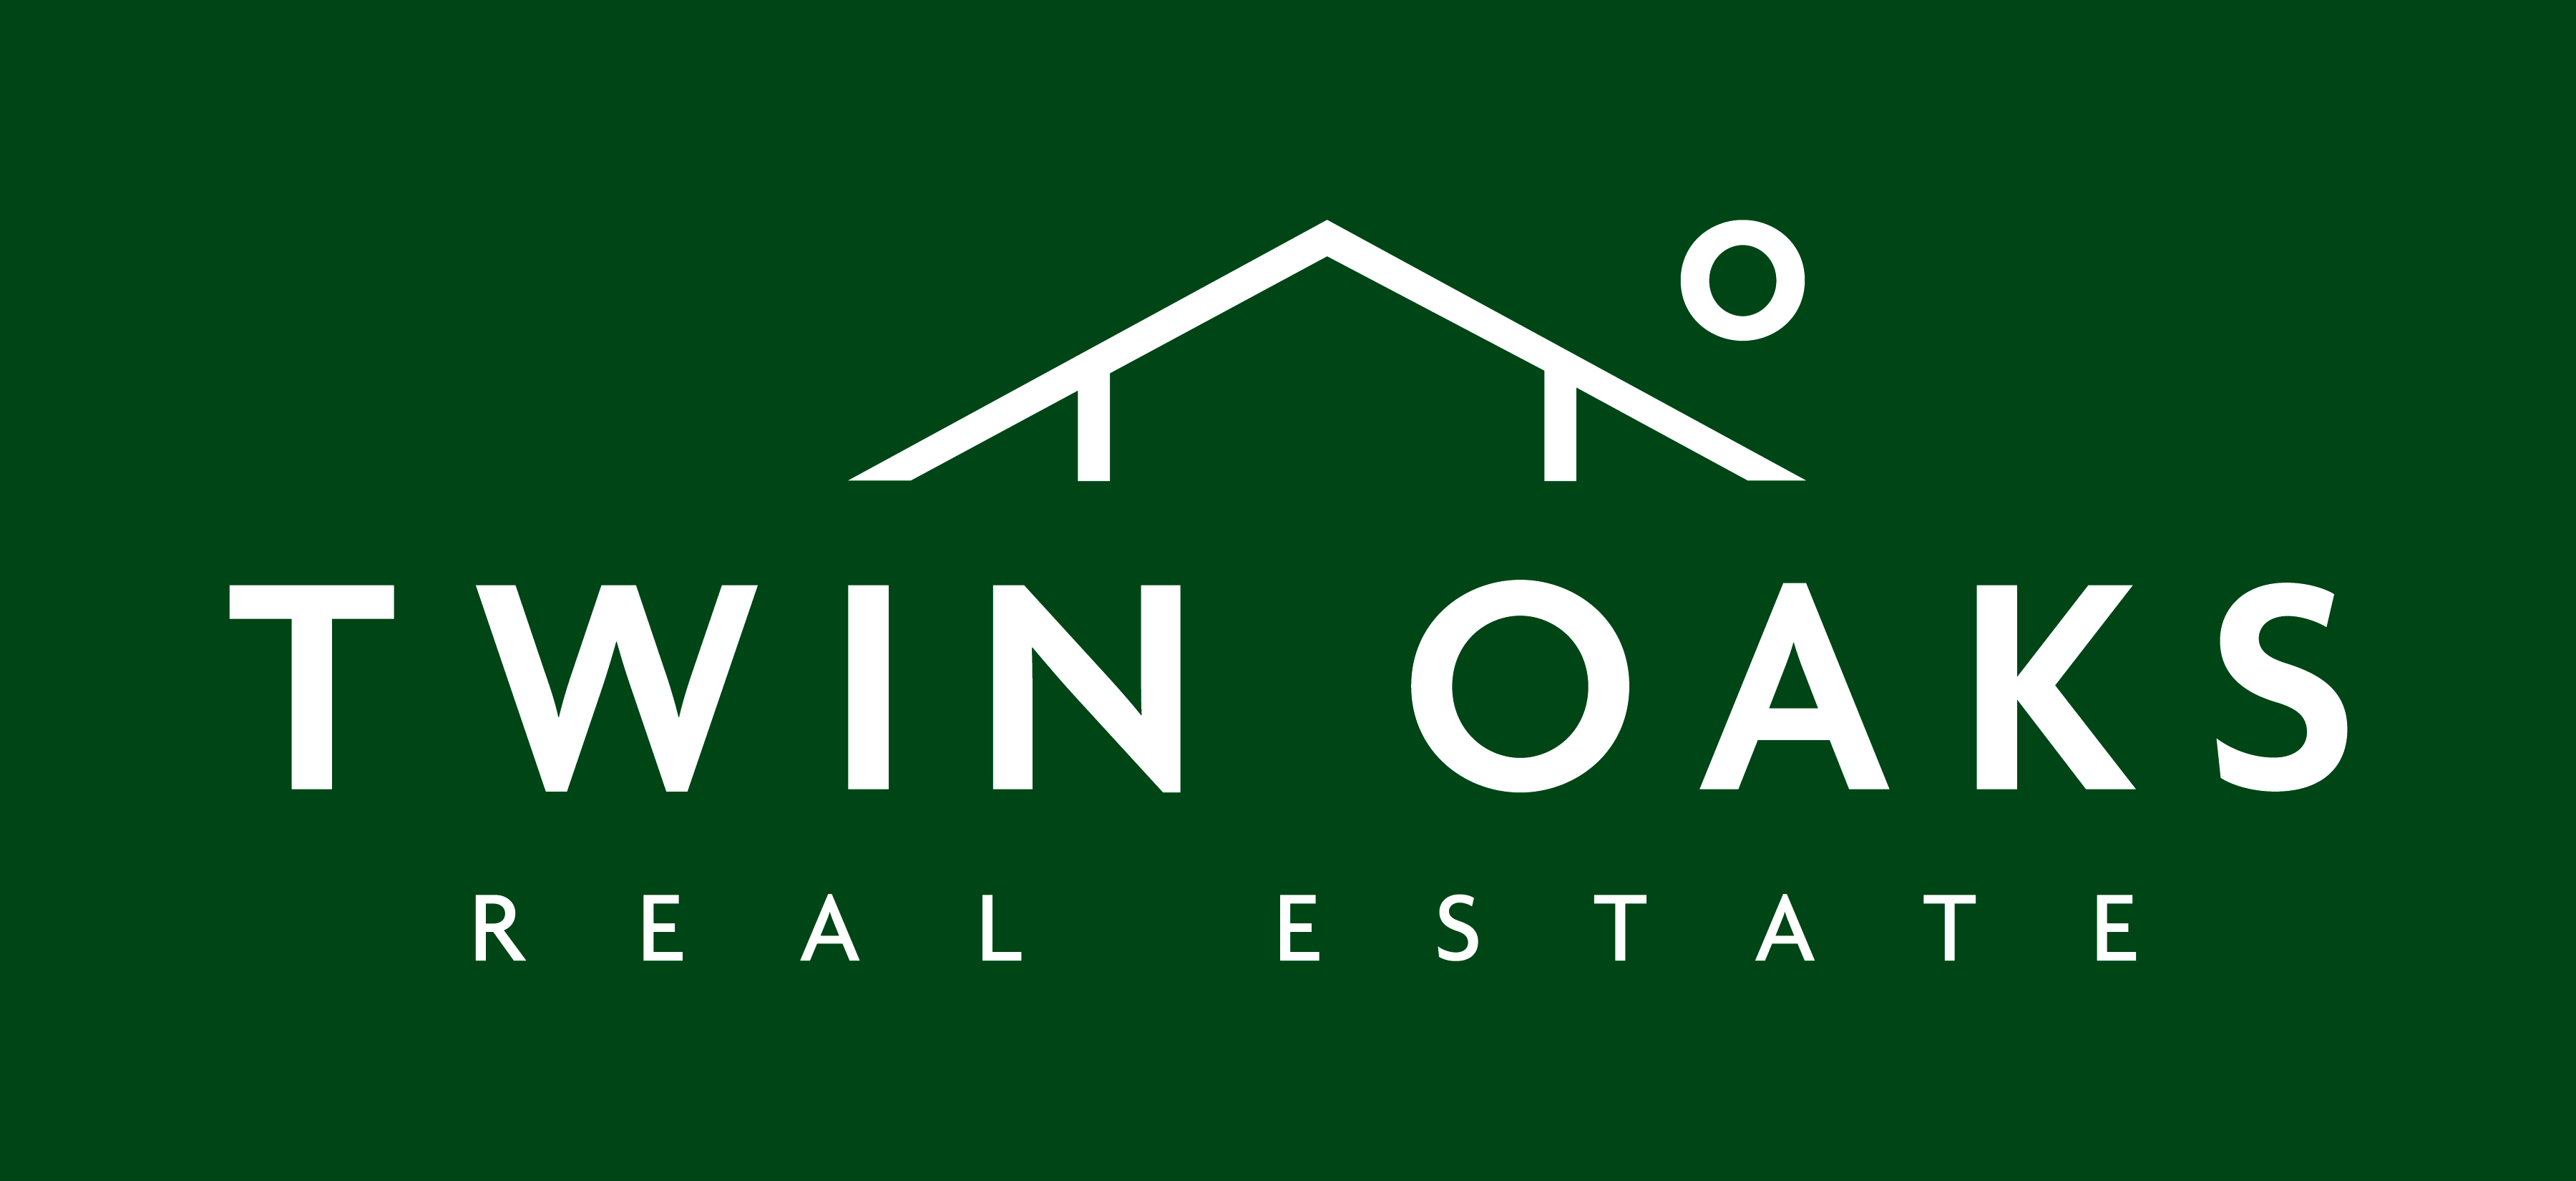 Twin Oaks Real Estate logo